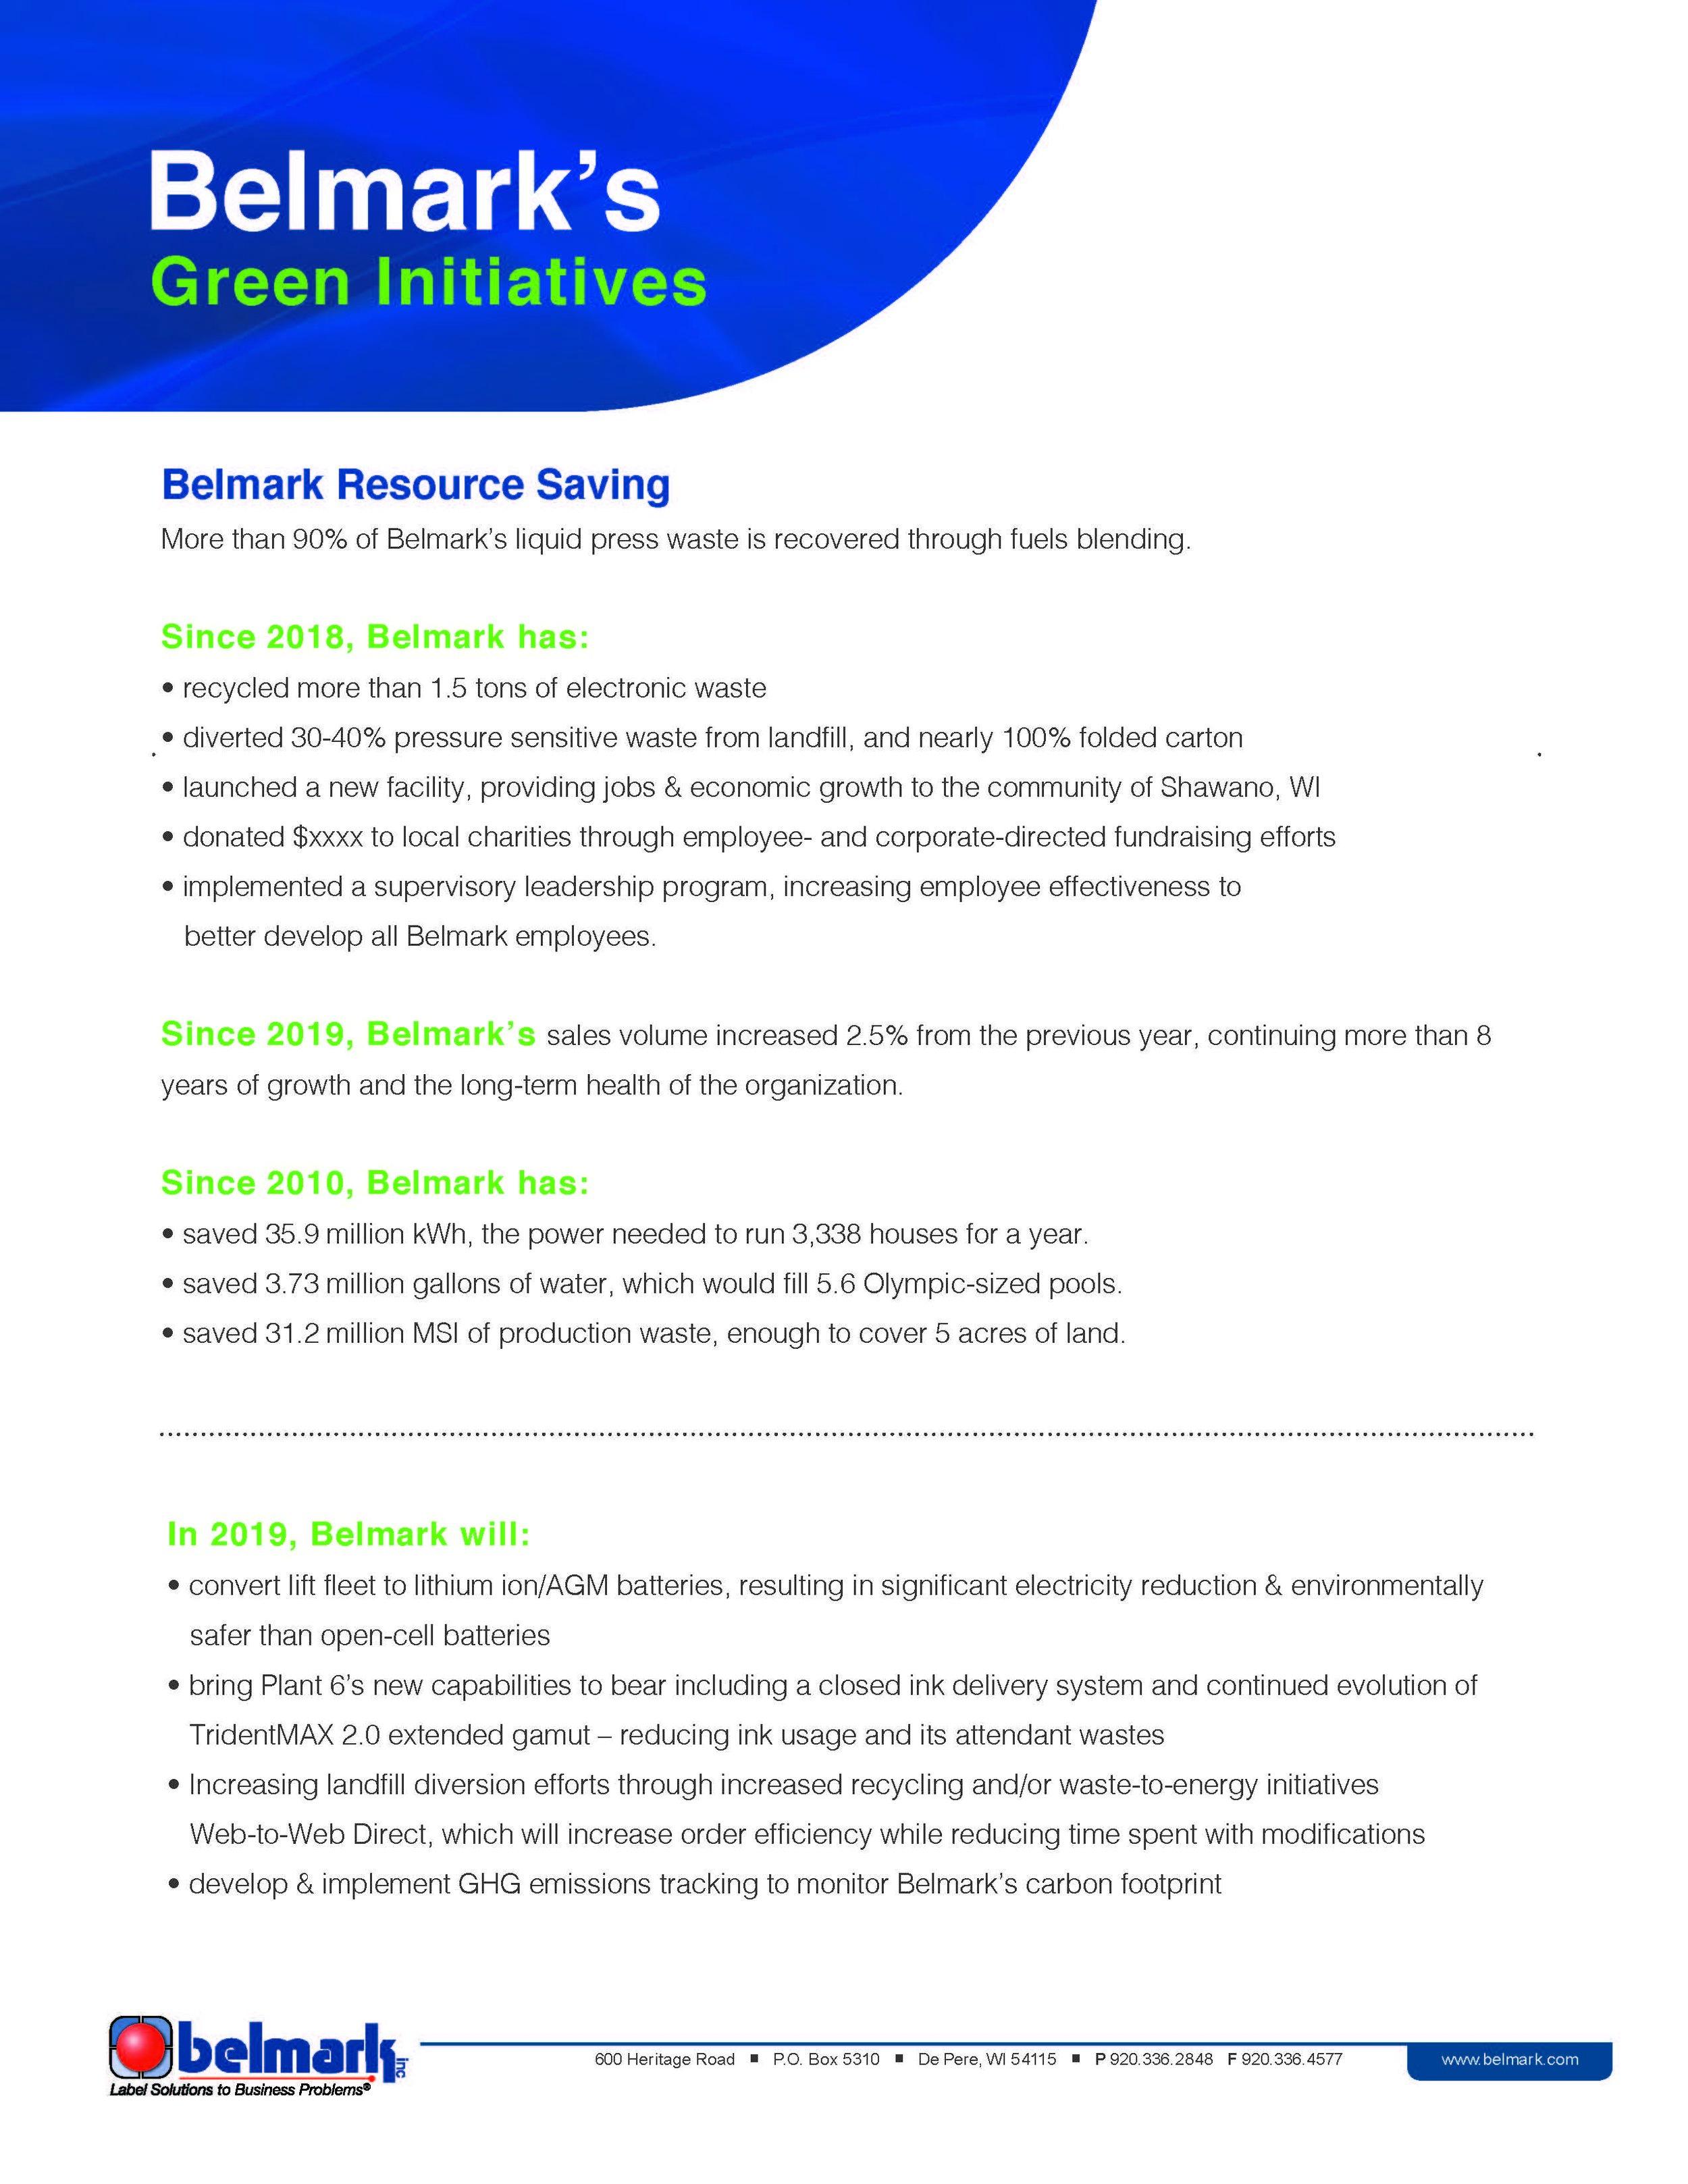 BELMARK GREEN INITIATIVES SELL SHEET_Page_1.jpg